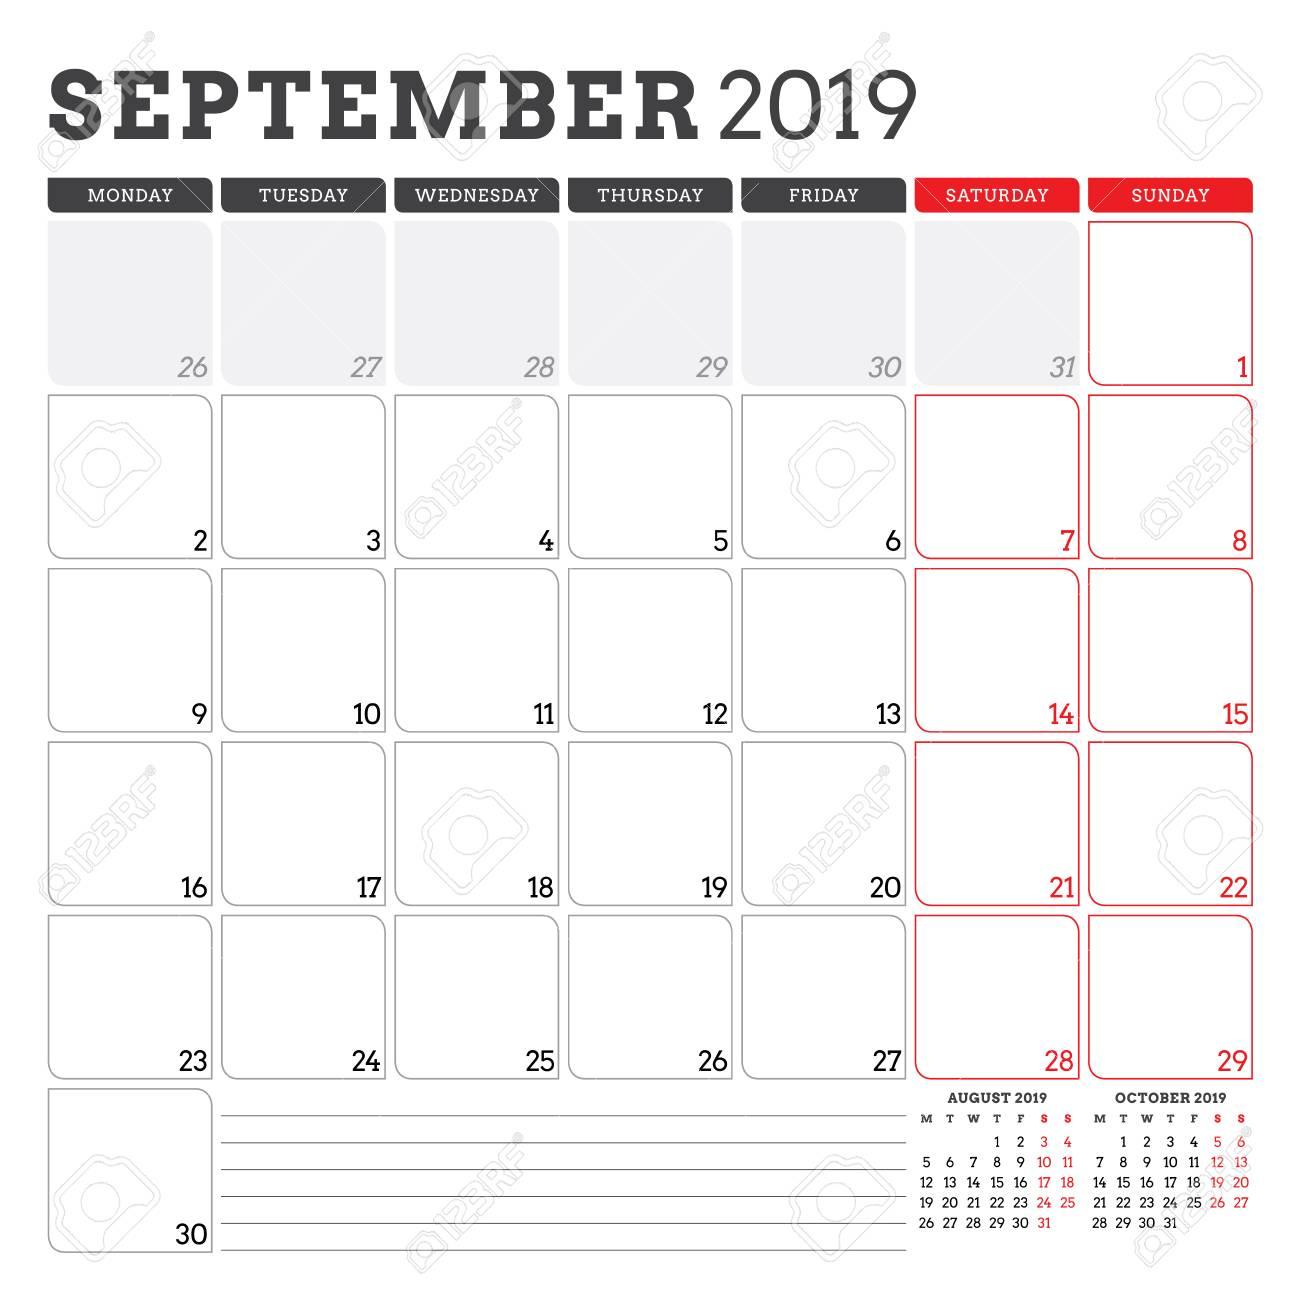 Calendar Planner For September 2019. Week Starts On Monday. Printable..